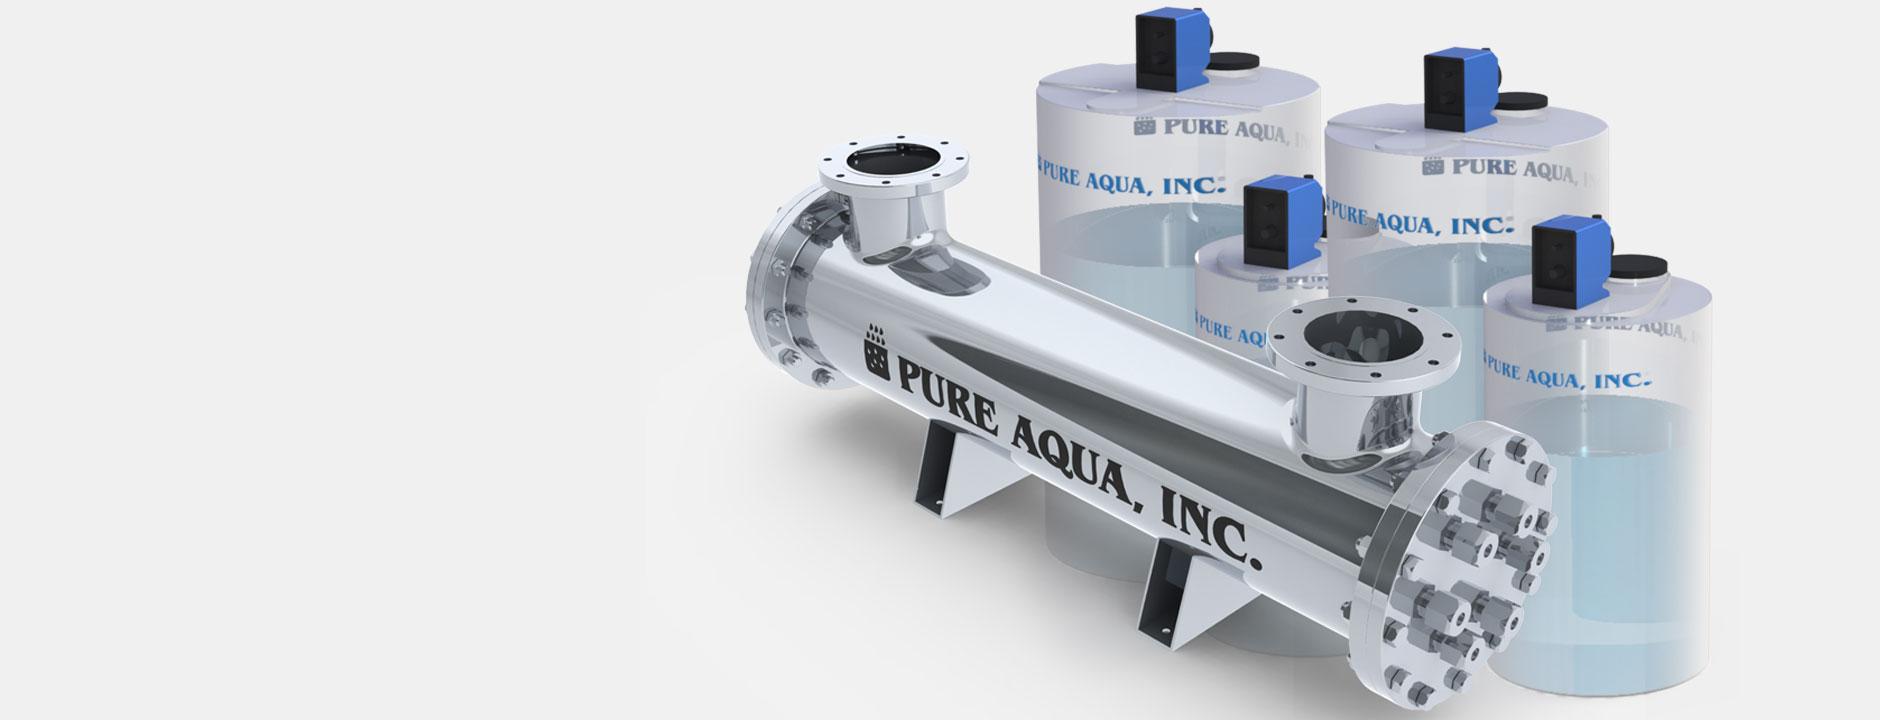 water disinfection systems معالجة المياه بإستخدام أنظمة الأشعة فوق البنفسجية و نظم حقن الكيماويات